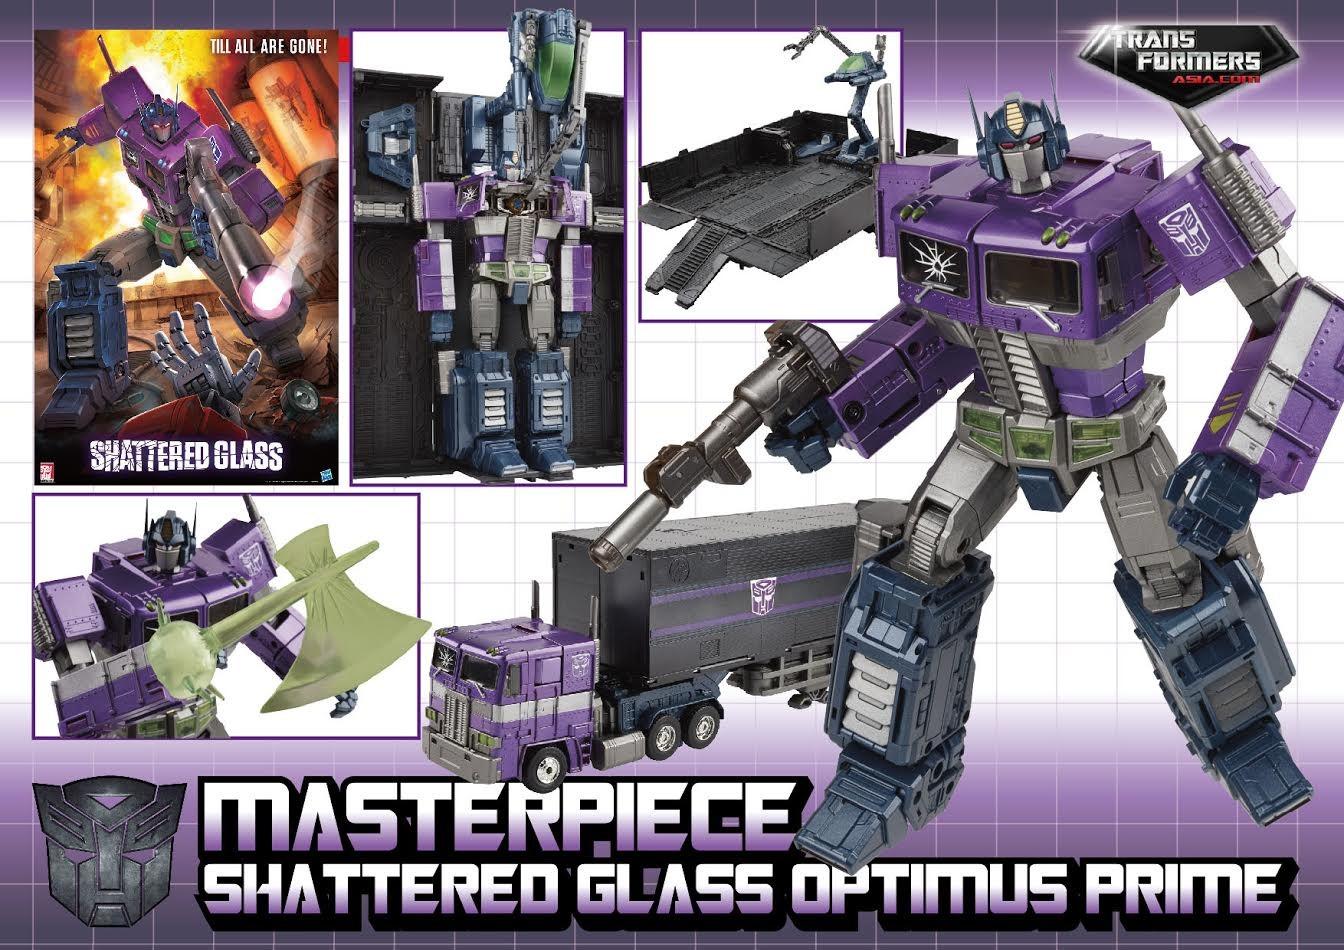 Optimus Prime Shattered Glass MP10 £69.99 + £2.95 postage at Kapow Toys